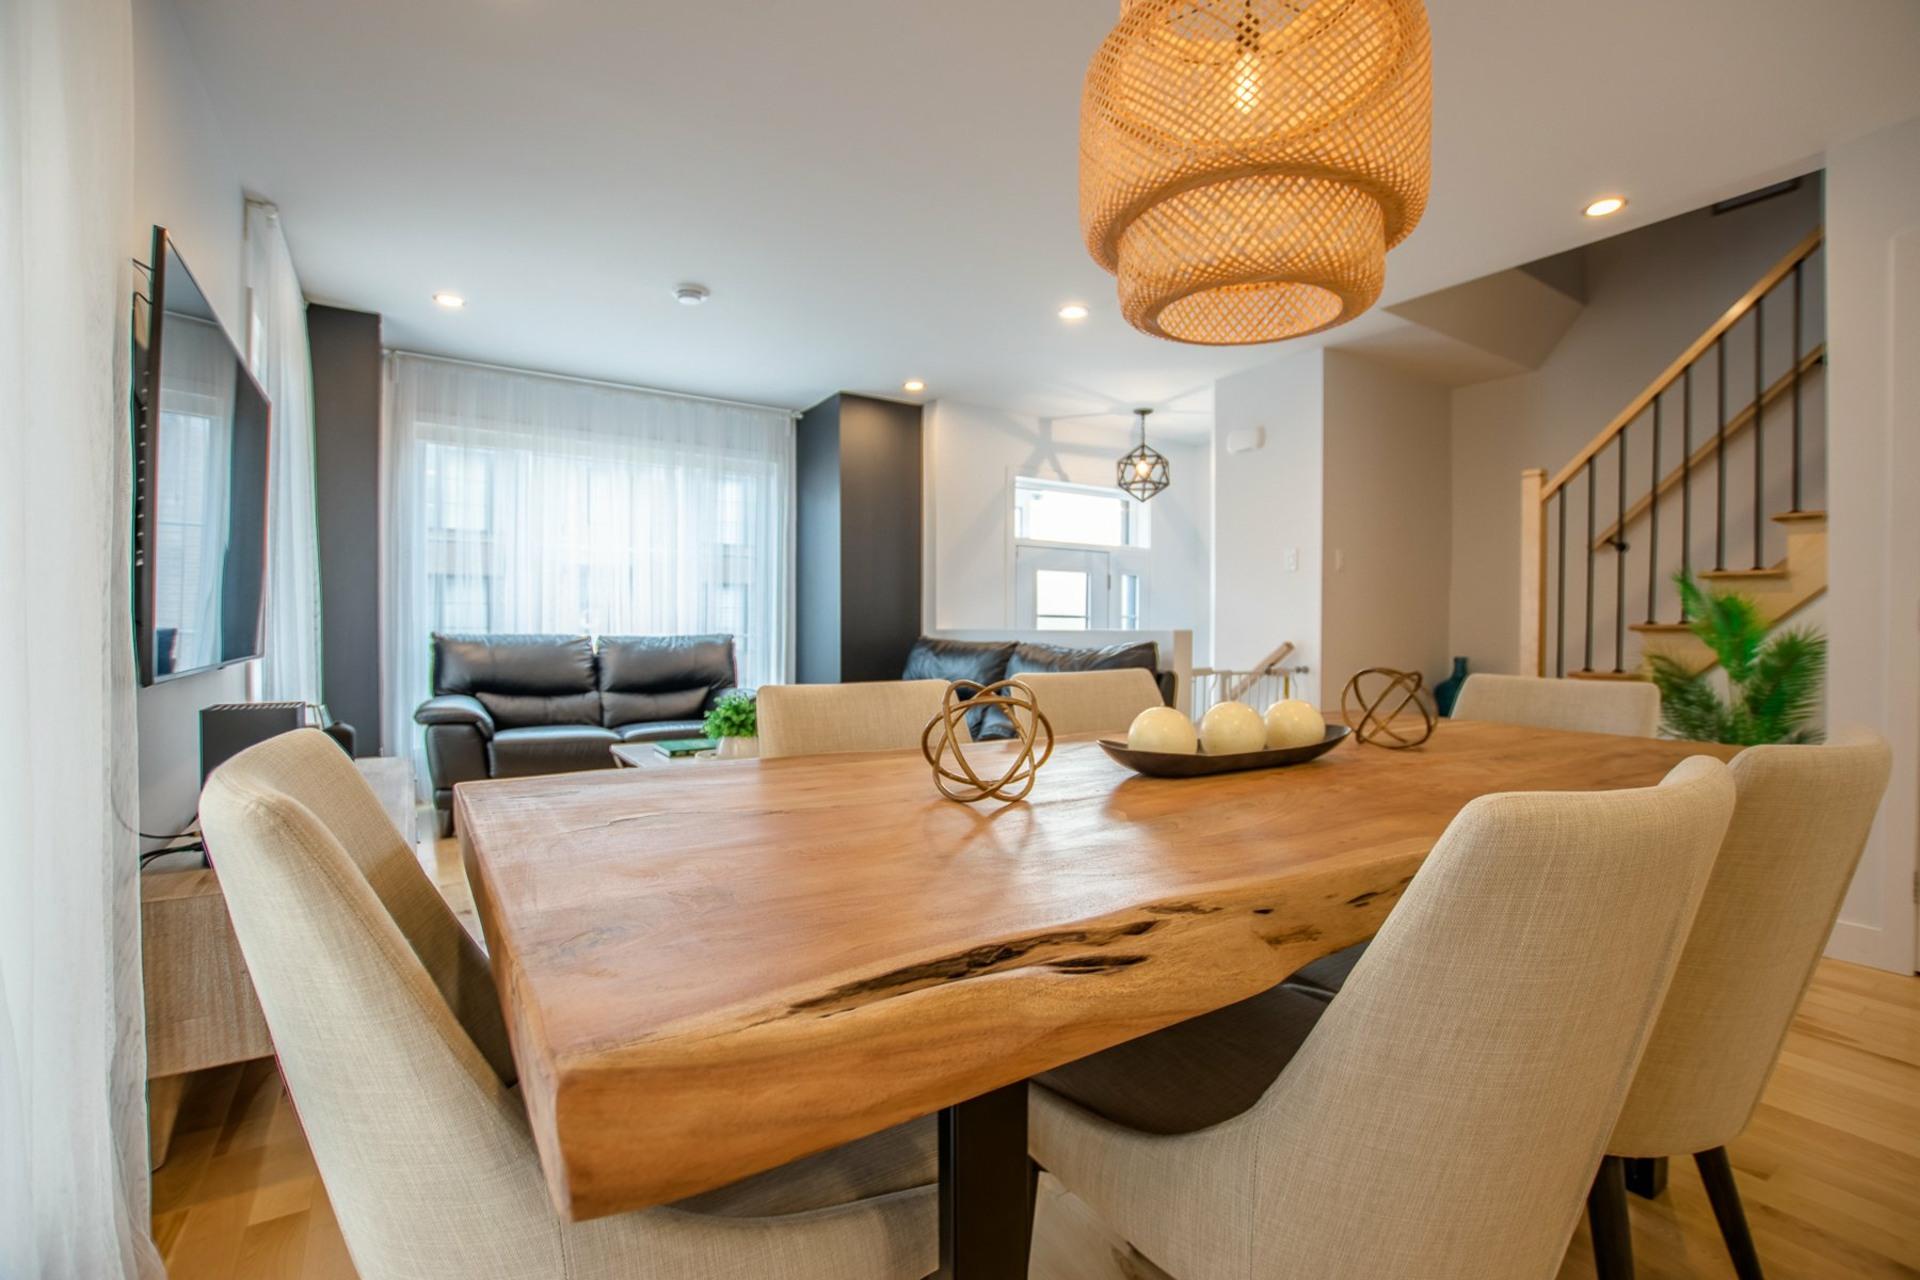 image 6 - MX - Casa sola - MX En venta Saint-Constant - 10 habitaciones